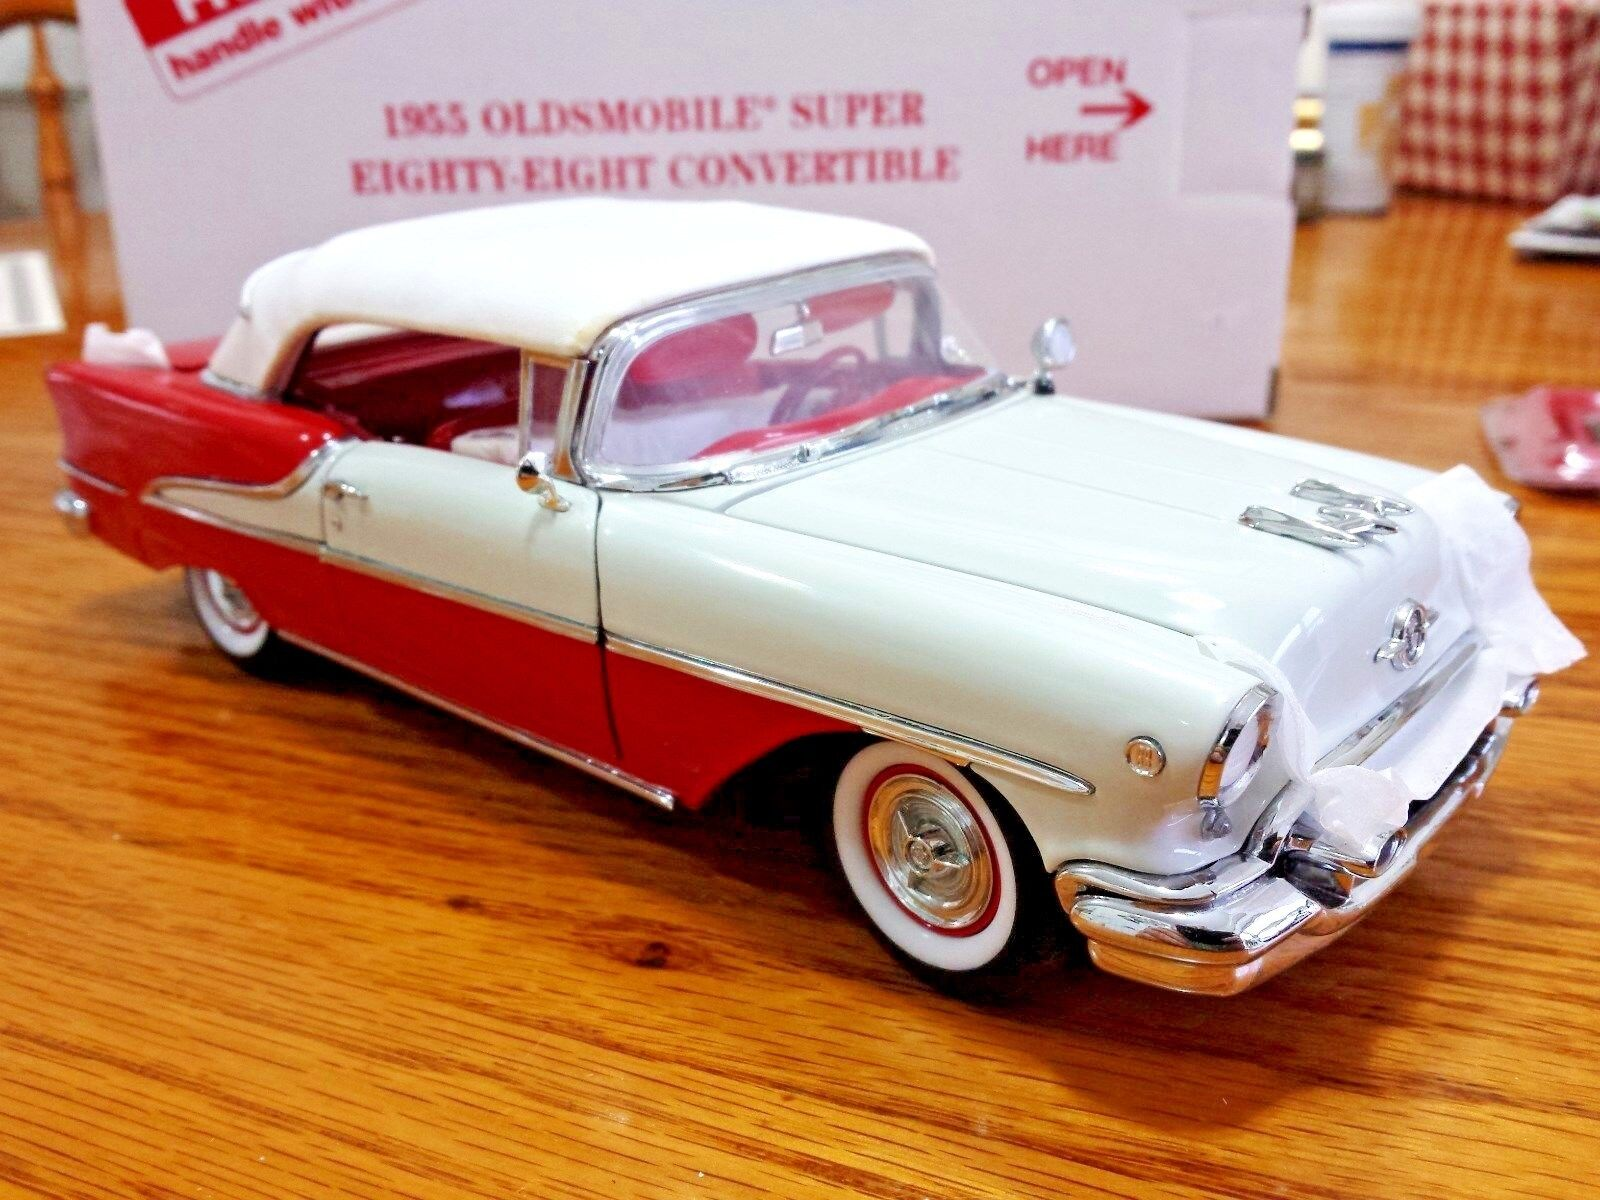 Danbury Mint 1955 Oldsmobile Super Eighty Eight Congreenible 1 24 Die Cast 121